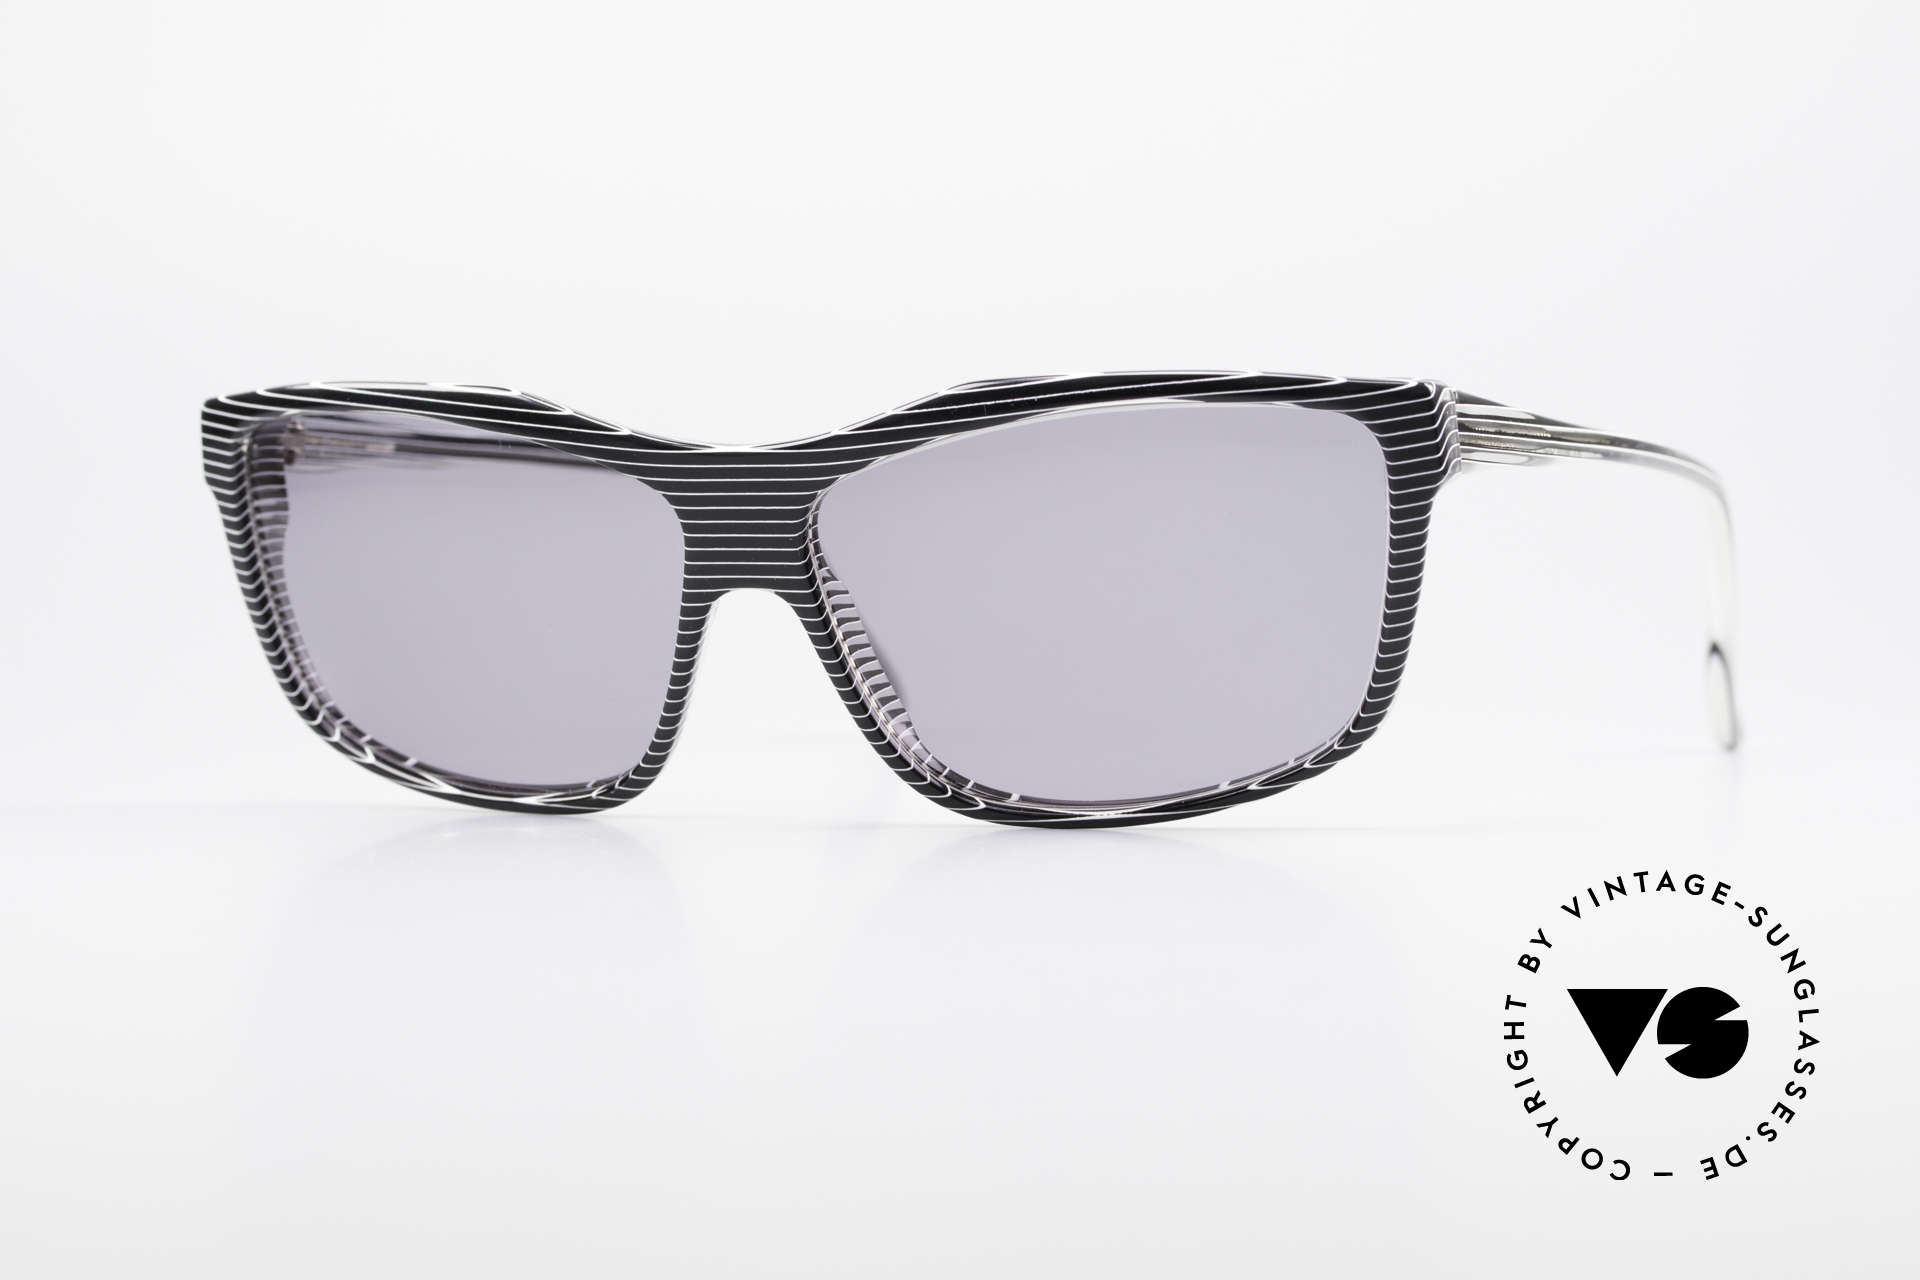 Alain Mikli 701 / 986 Rare 80s Designer Sunglasses, vintage ALAIN MIKLI designer sunglasses from 1988, Made for Women